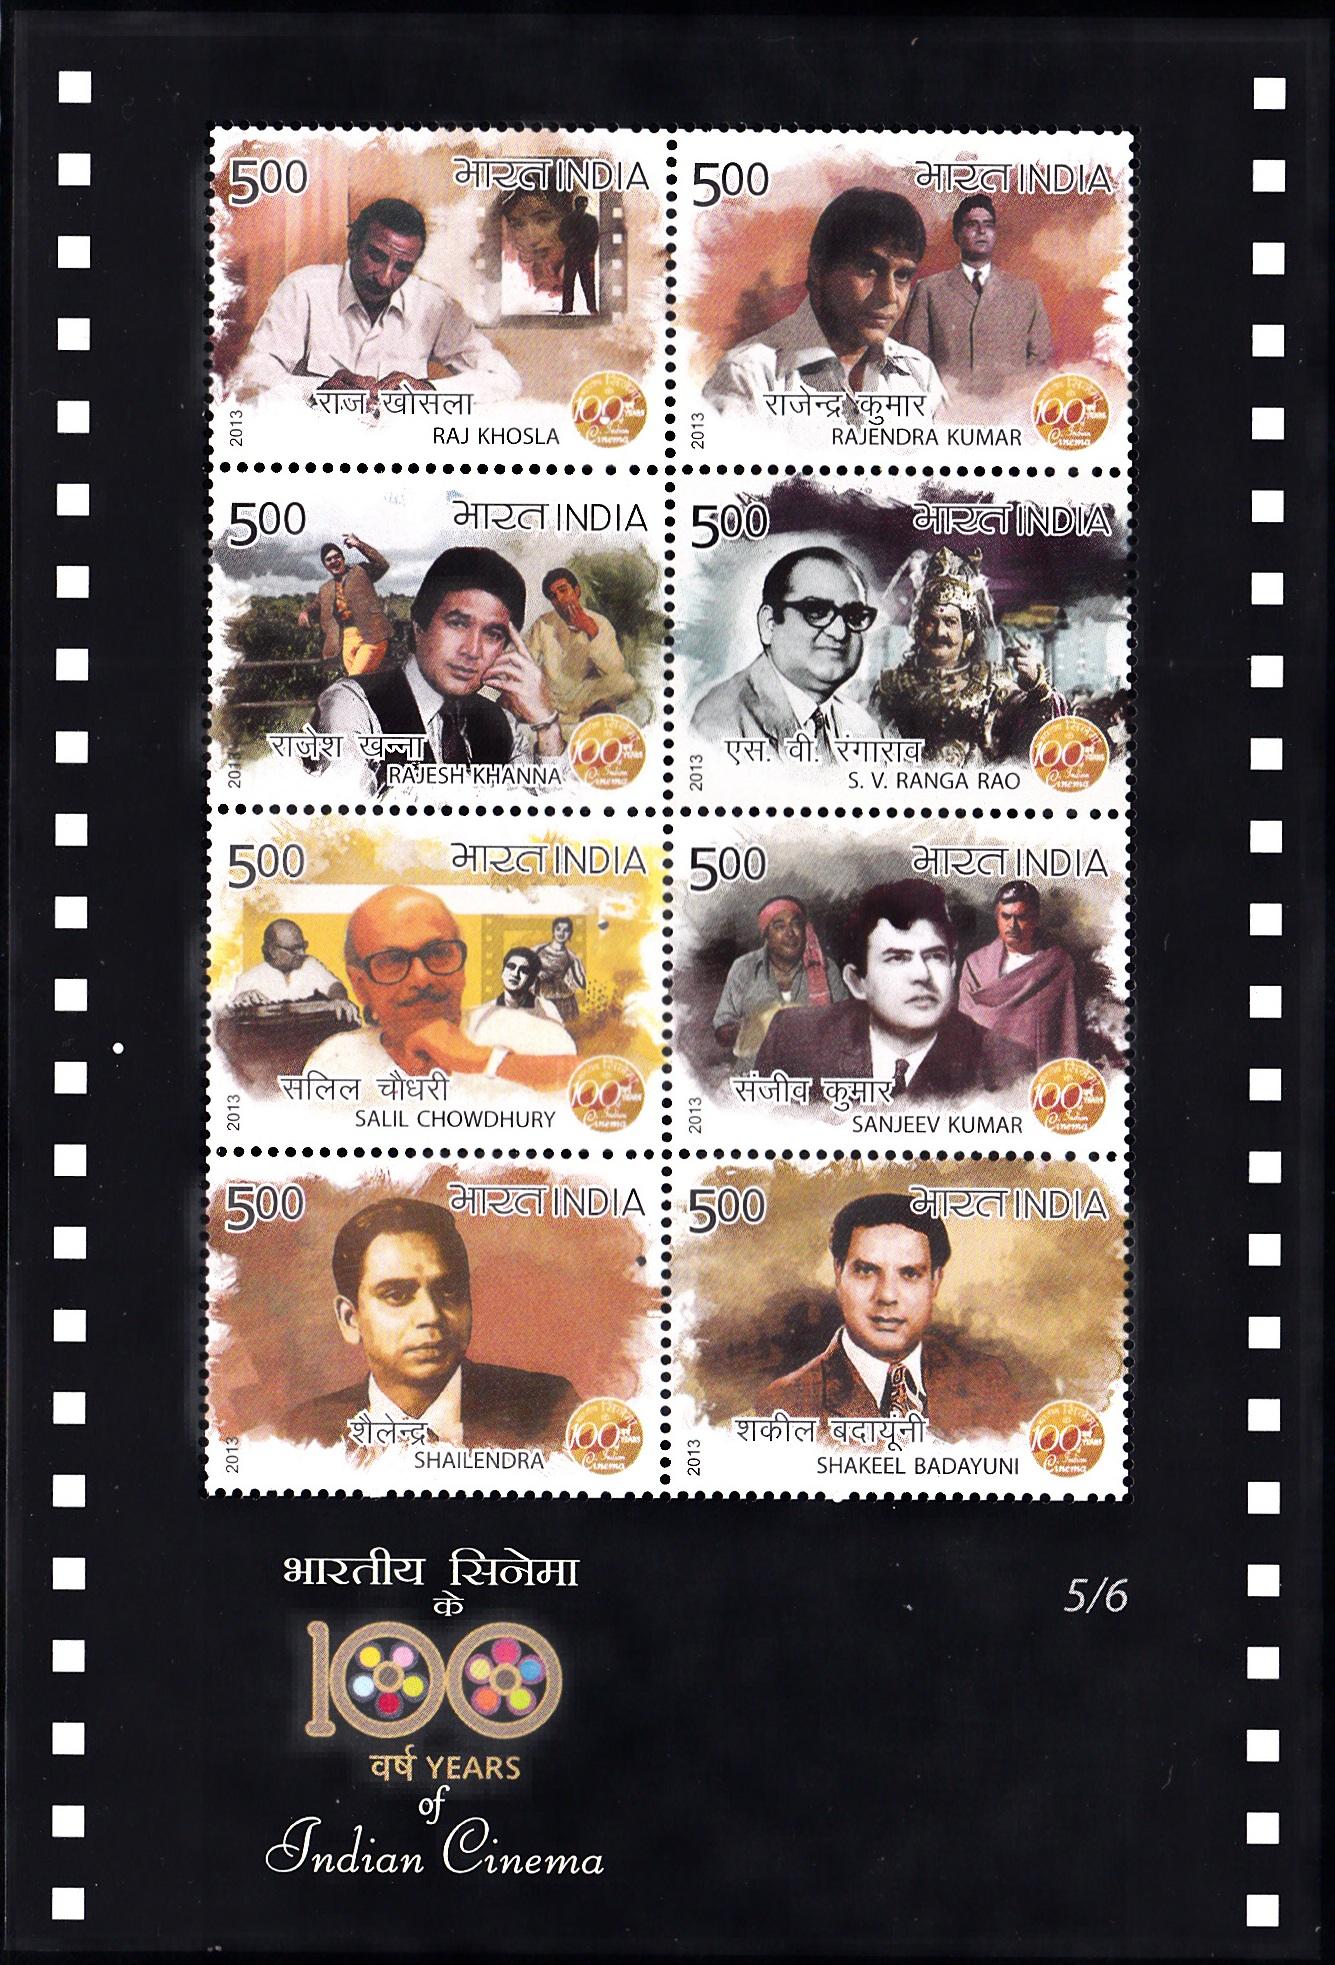 Indian Cinema Centenary : Miniature Sheet 5